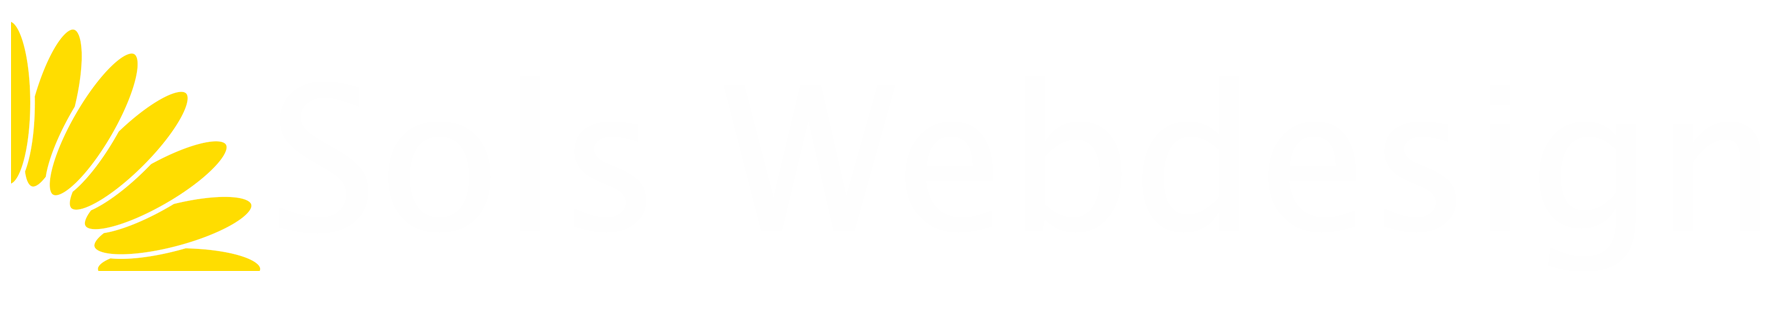 SolsWebdesign